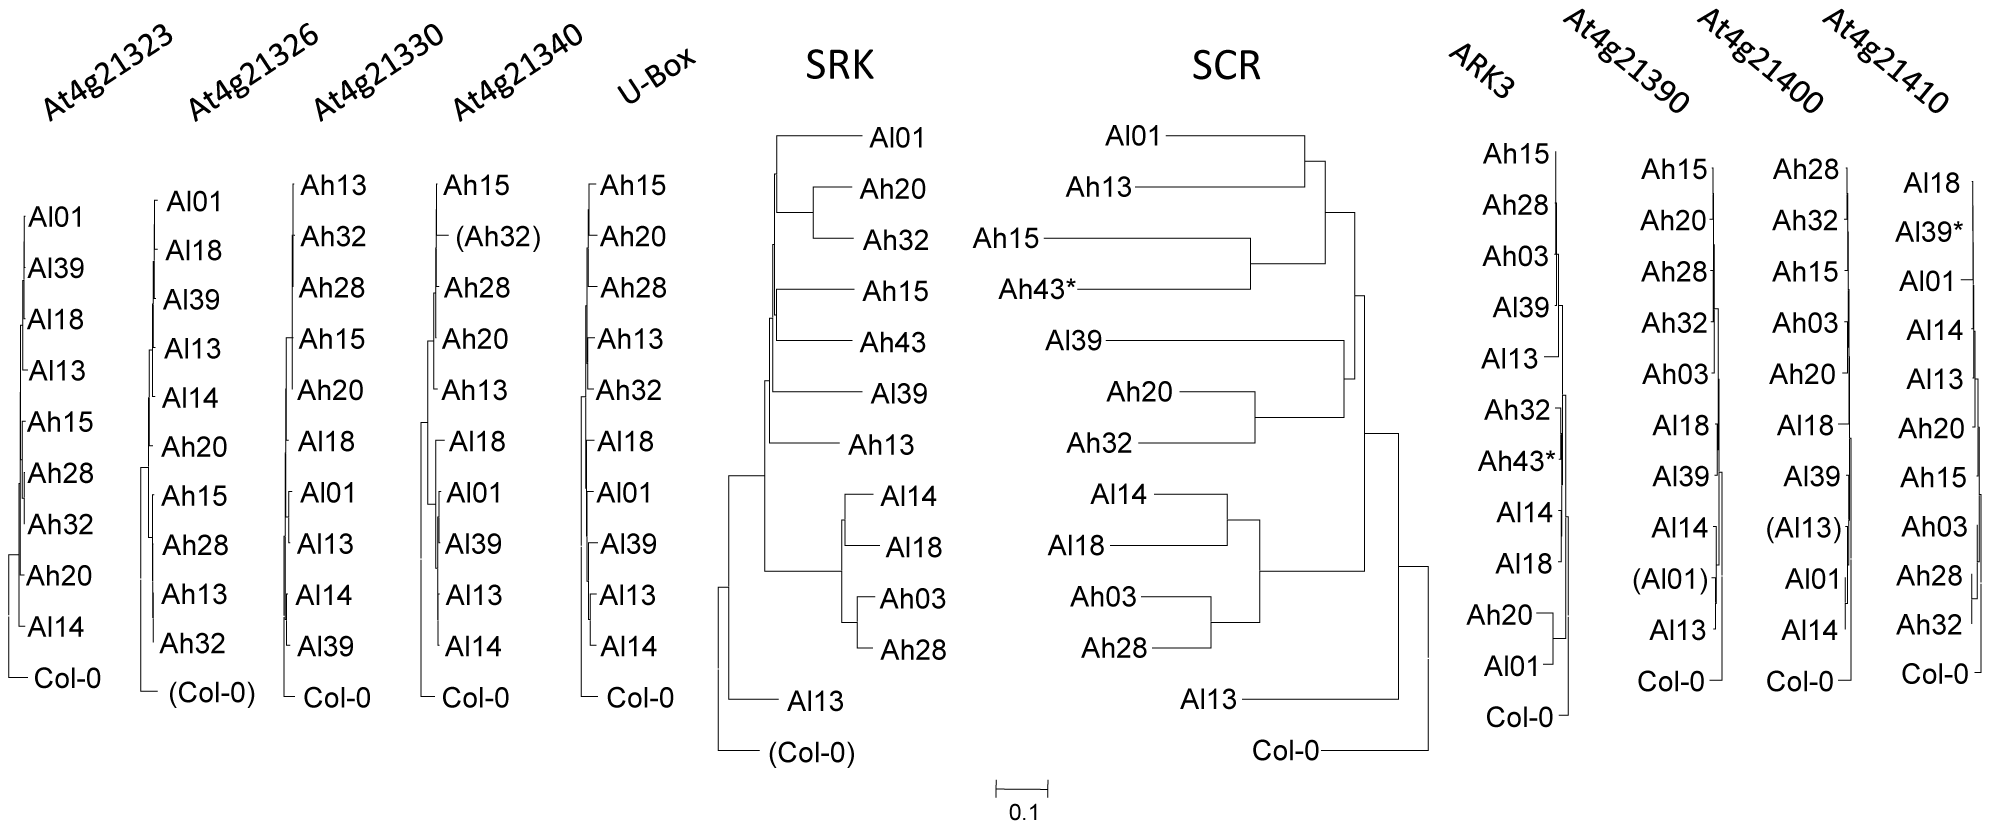 Gene phylogenies in and around the S-locus region.